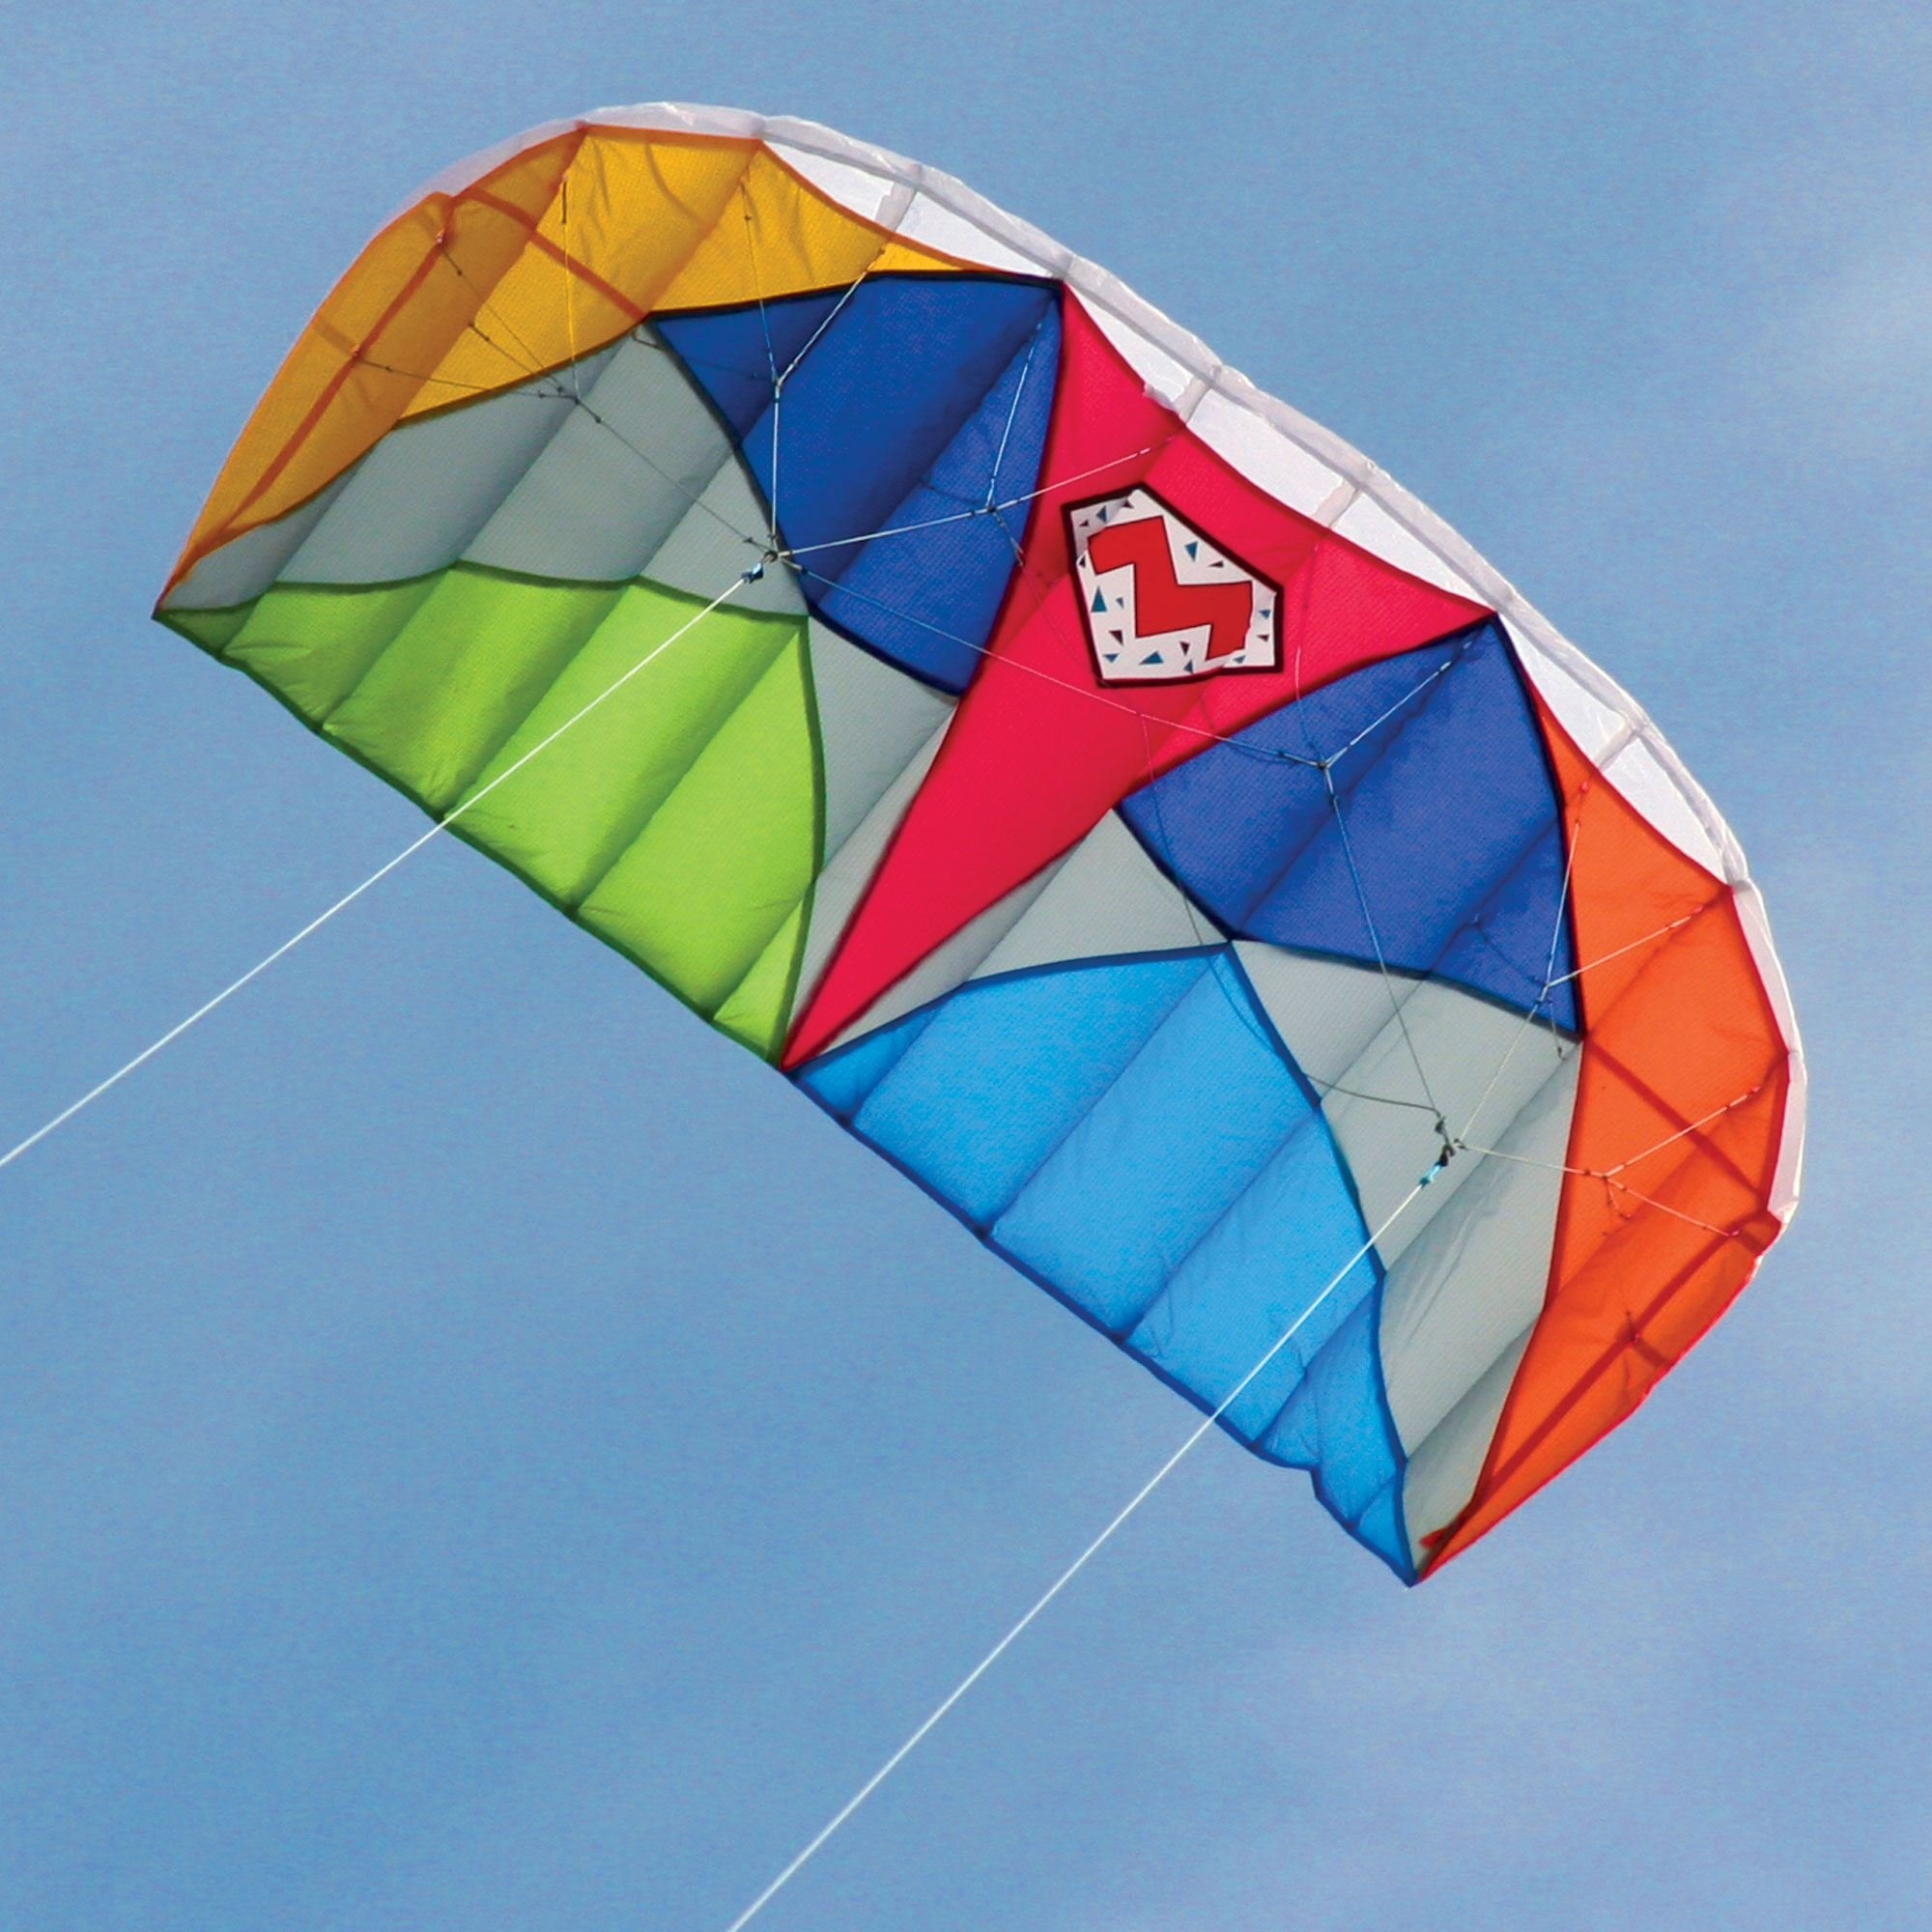 Mighty Bug 1.0 Dual line Airfoil Stunt Kite